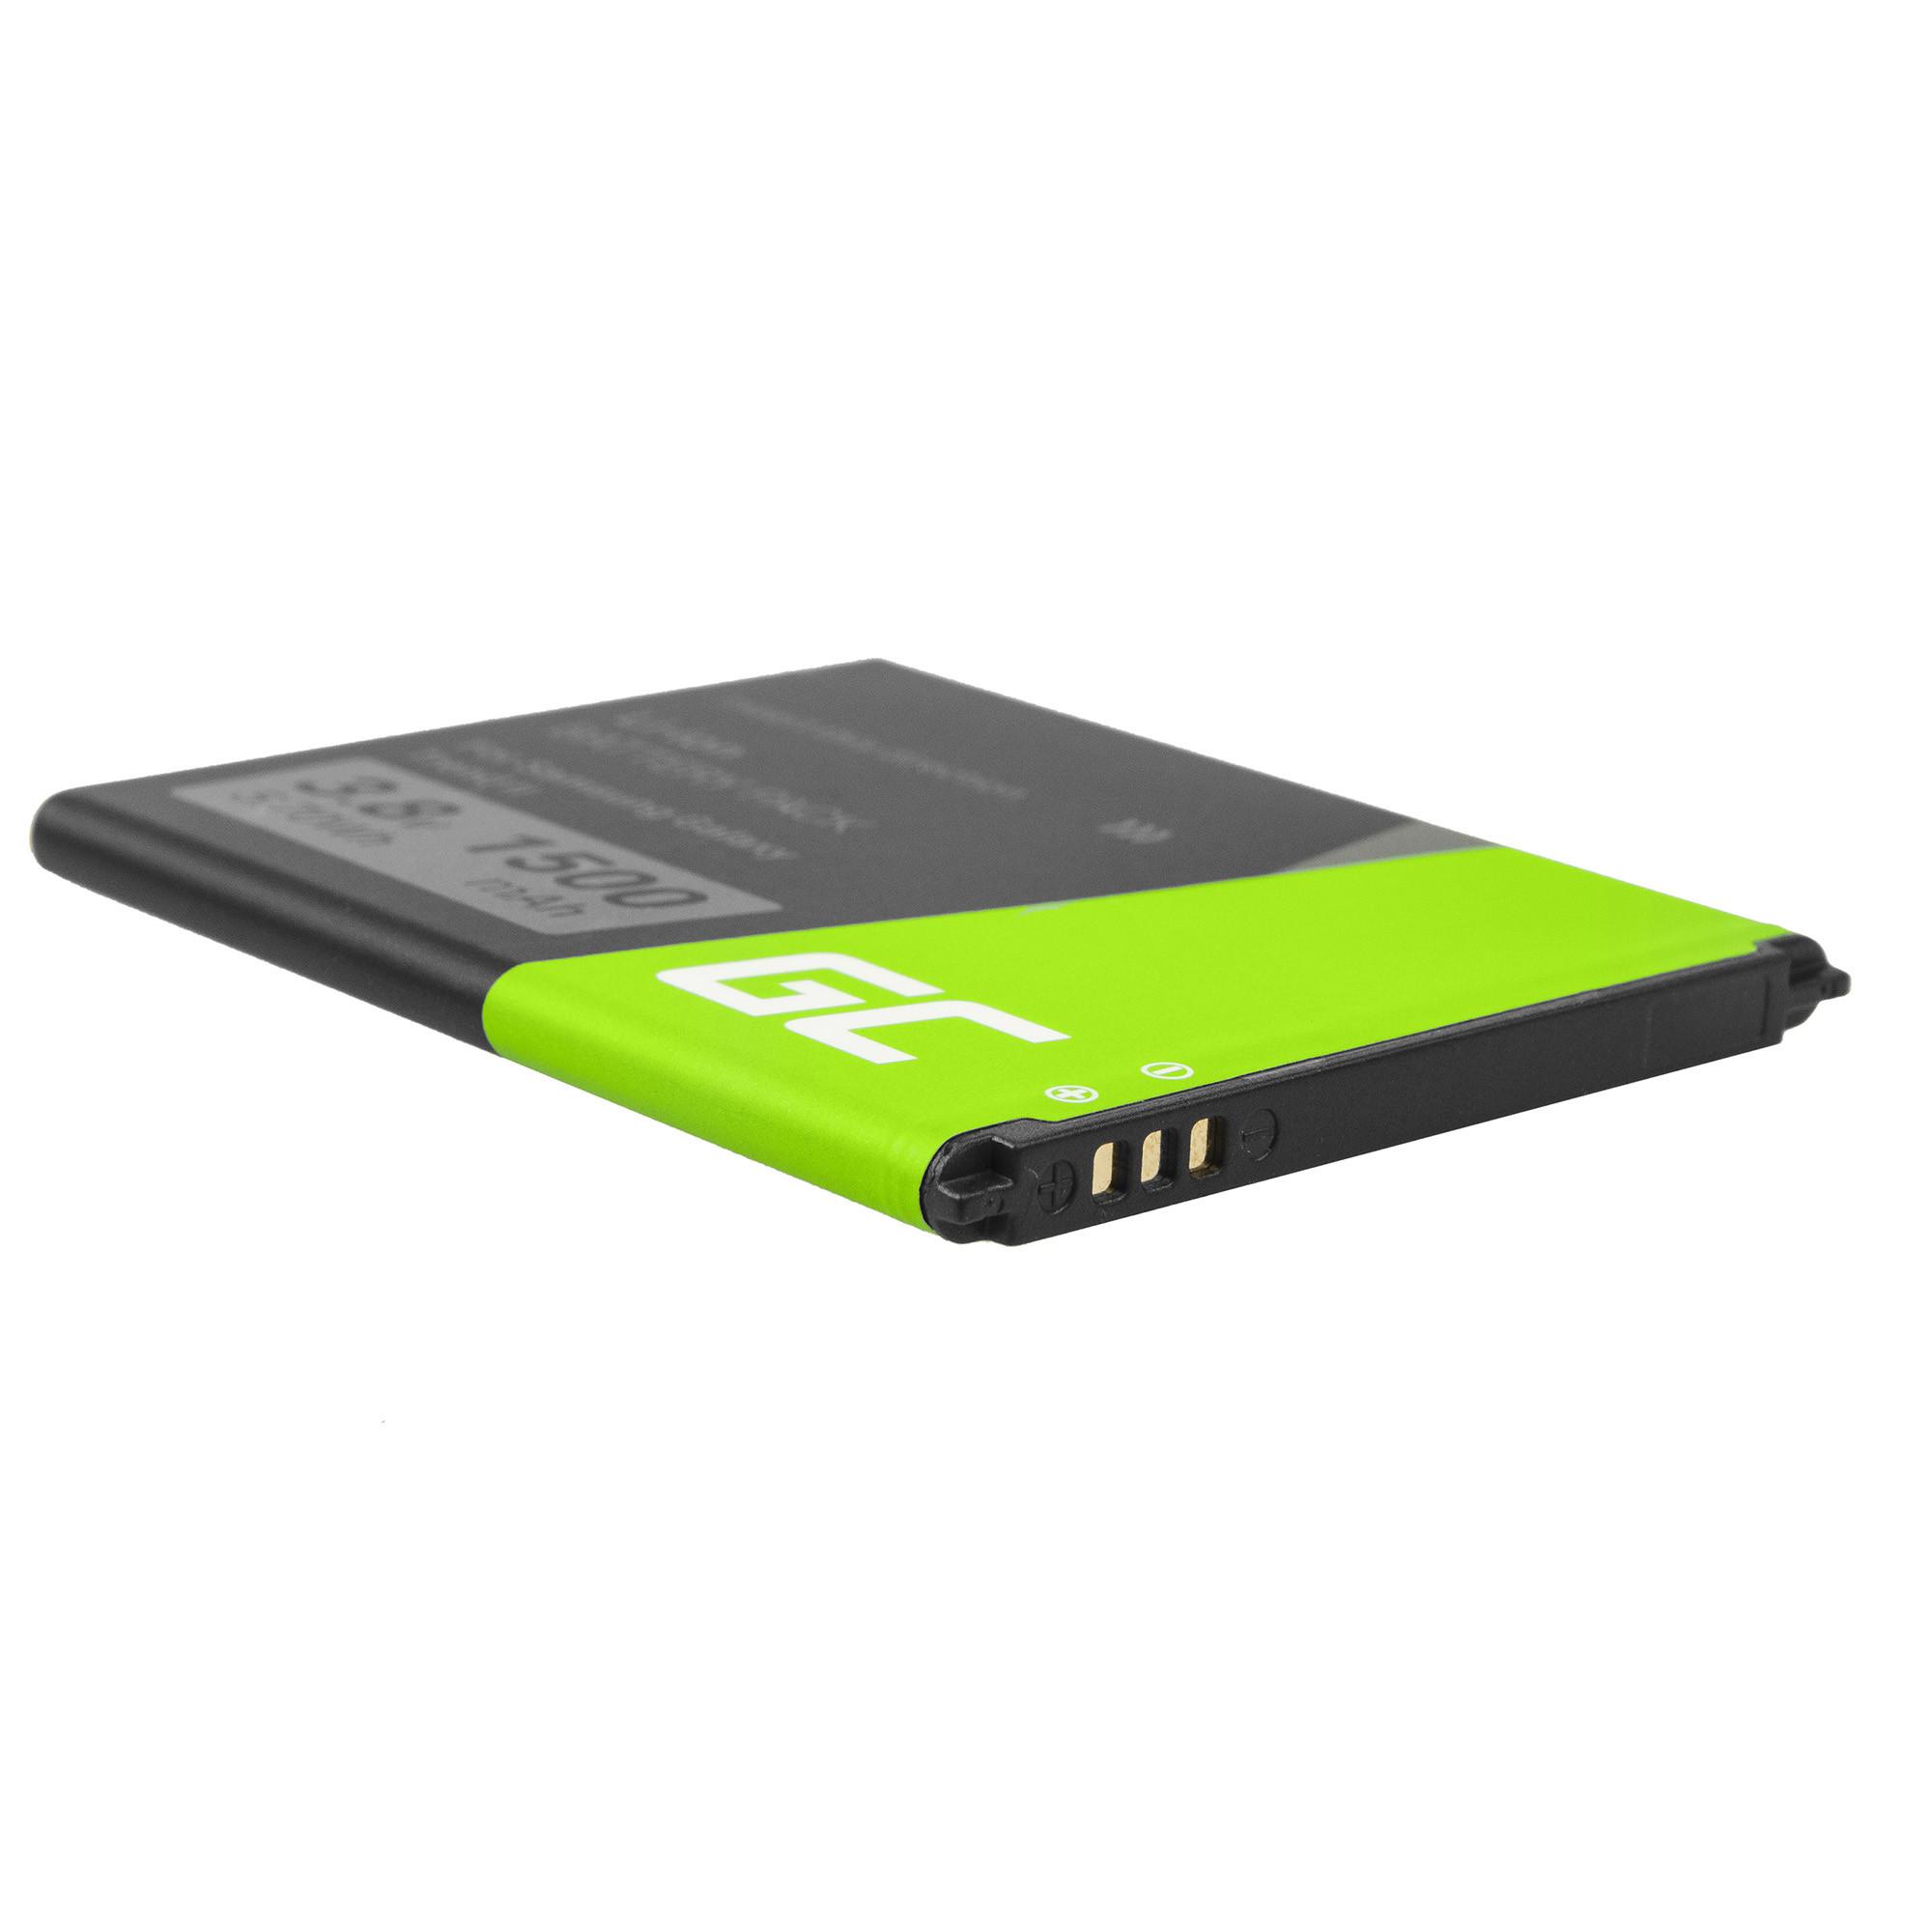 Baterie Green Cell Samsung EB-L1G6LL Samsung Galaxy SIII S3 1500mAh Li-ion - neoriginální